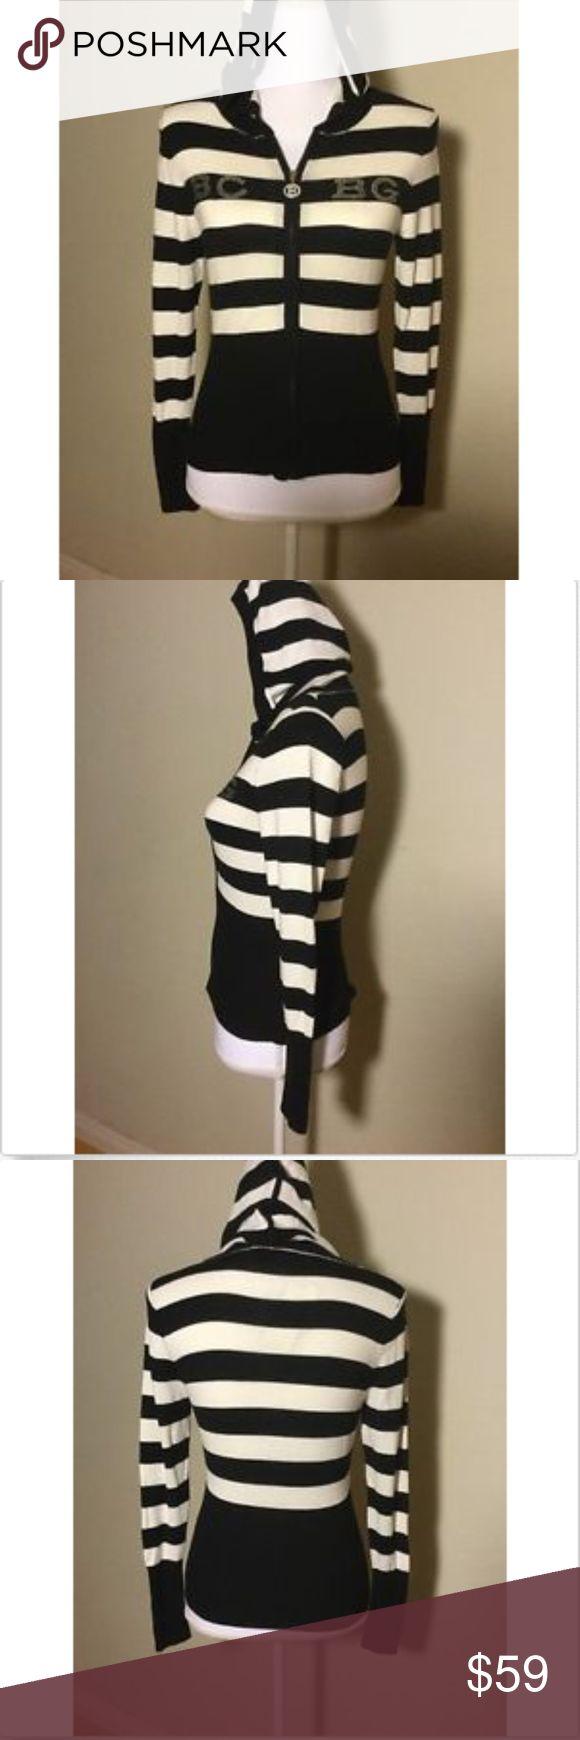 BCBG Maxazria Women's Stripe Full Zip Up Hoodie BCBG Maxazria Women's Stripe Full Zip Up Light Hoodie Size Medium Black/White  Color: black and white  Tag price: $140.00  Size: Medium BCBGMaxAzria Sweaters Cardigans